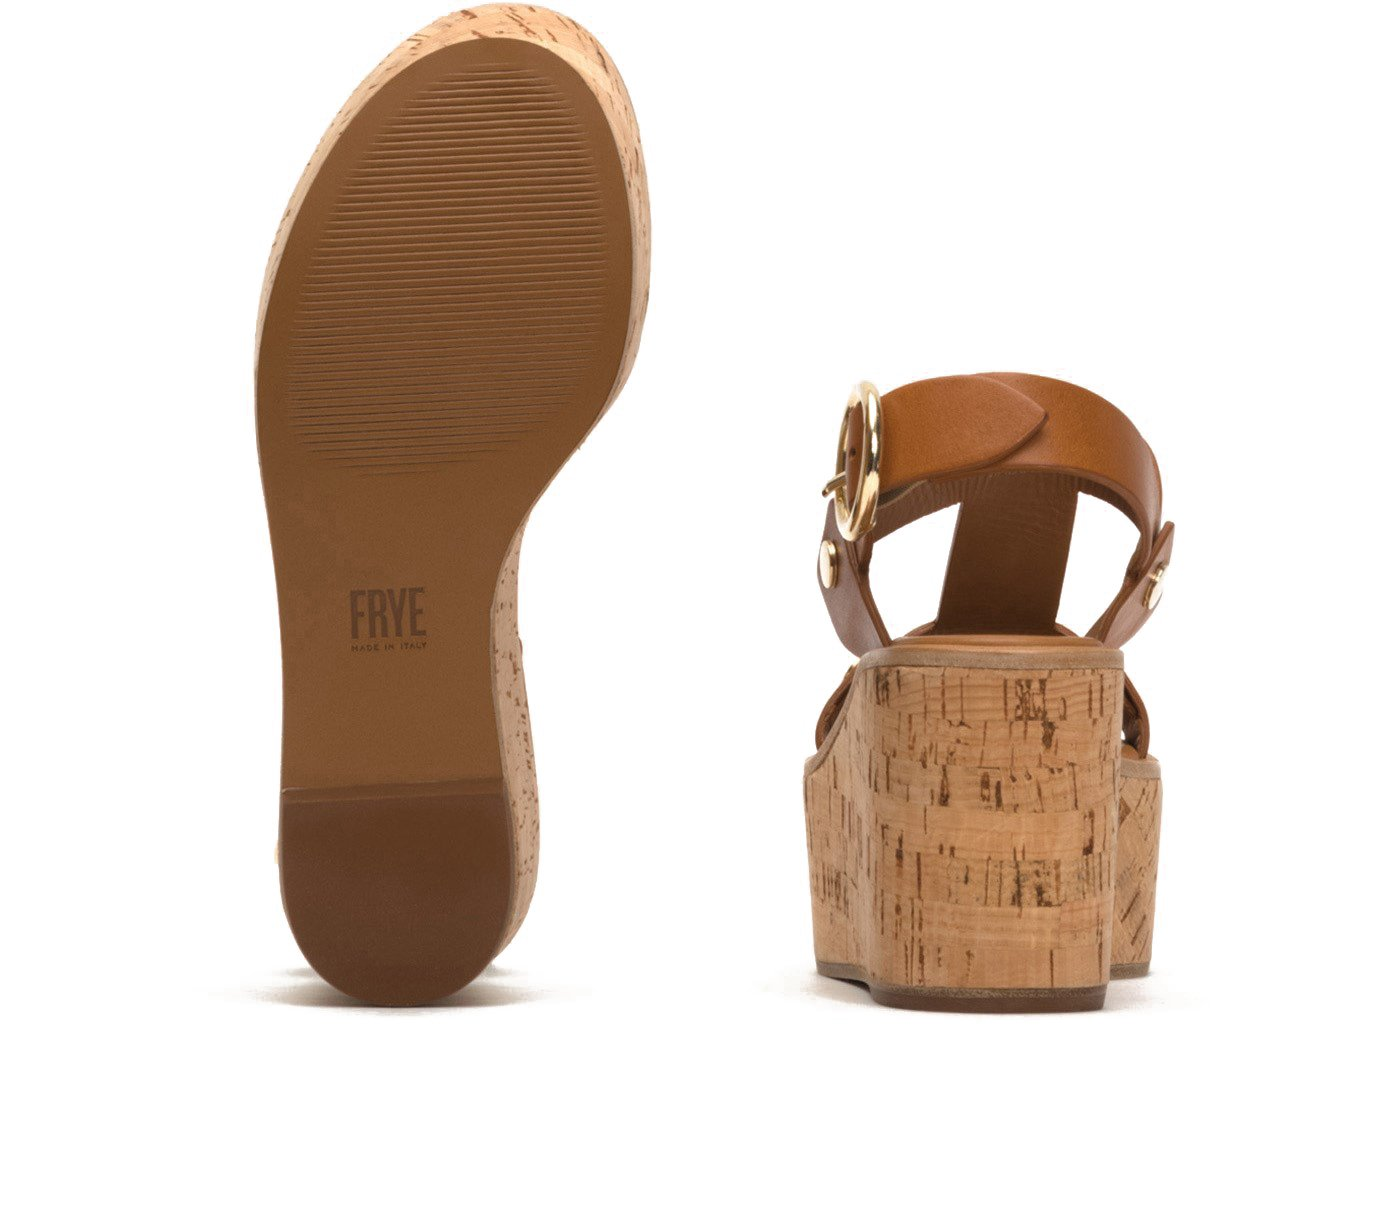 FRYE 79956 Women's Dahlia Rivet Wedge Sandal B076KKRHG4 7.5 B(M) US|Caramel